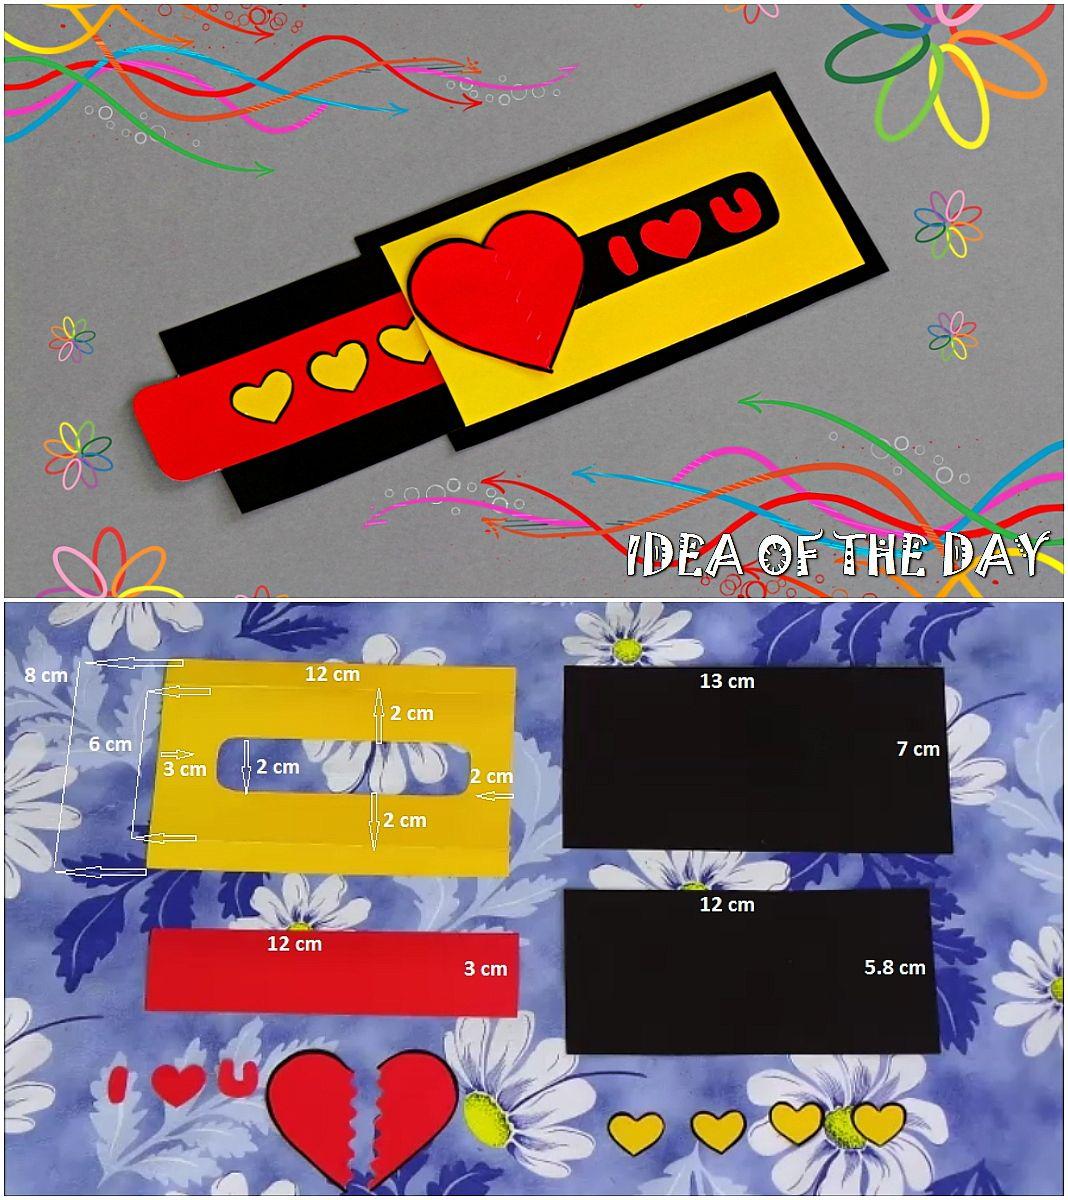 Diy Love Slider Card Tutorial This Measurements For Love Slider Card How To Make Love Slider Card By I Slider Cards Greeting Cards Handmade Cards Handmade